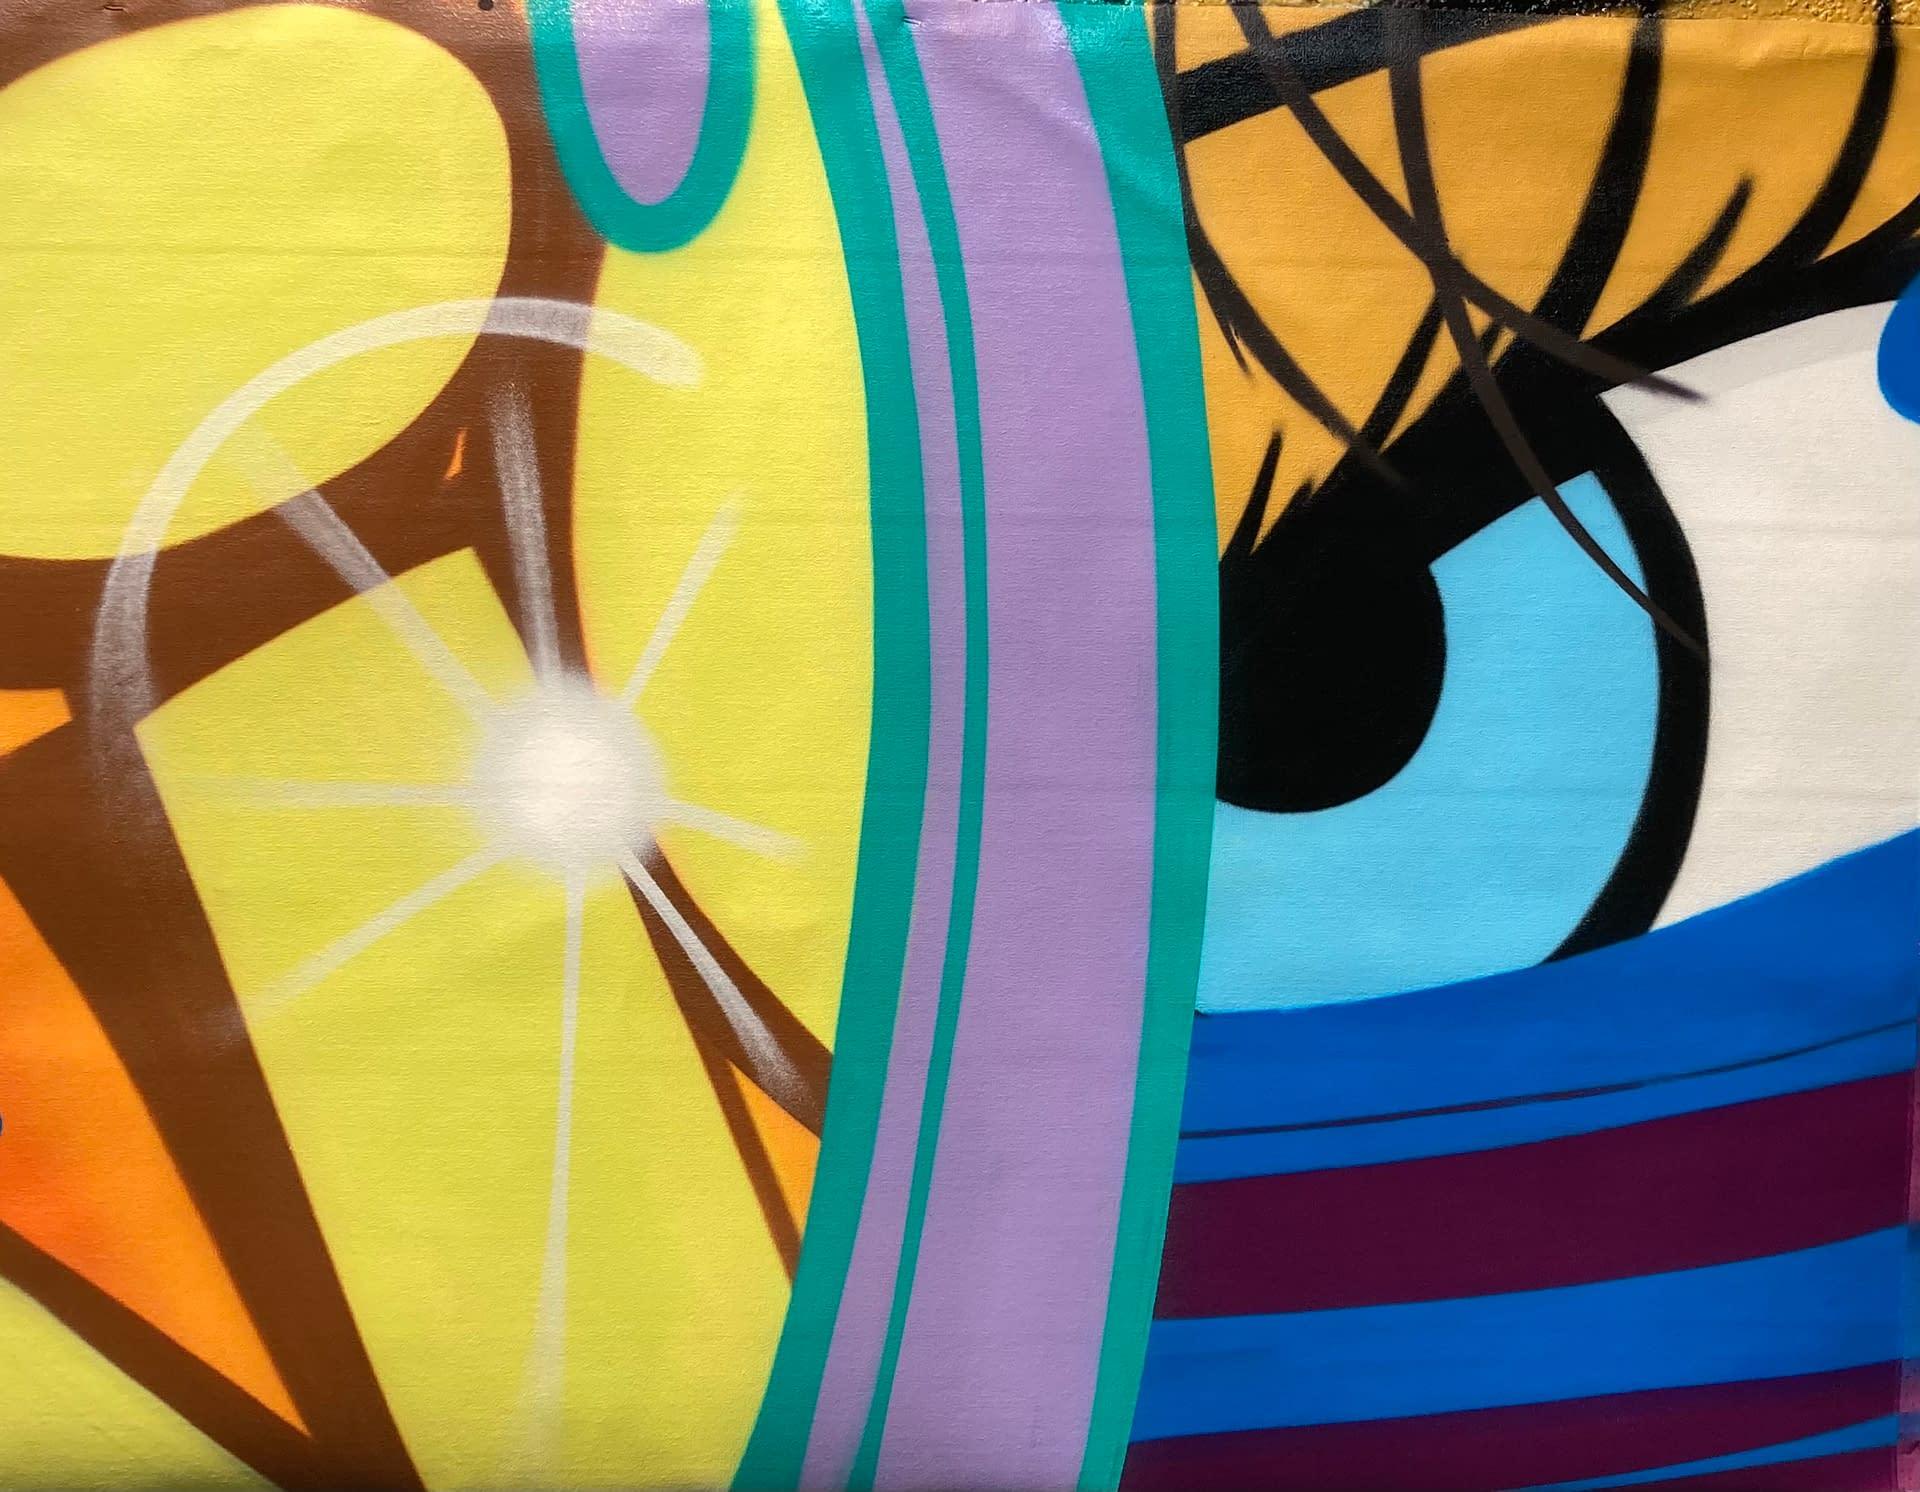 john crash matos spray paint graffiti art on canvas